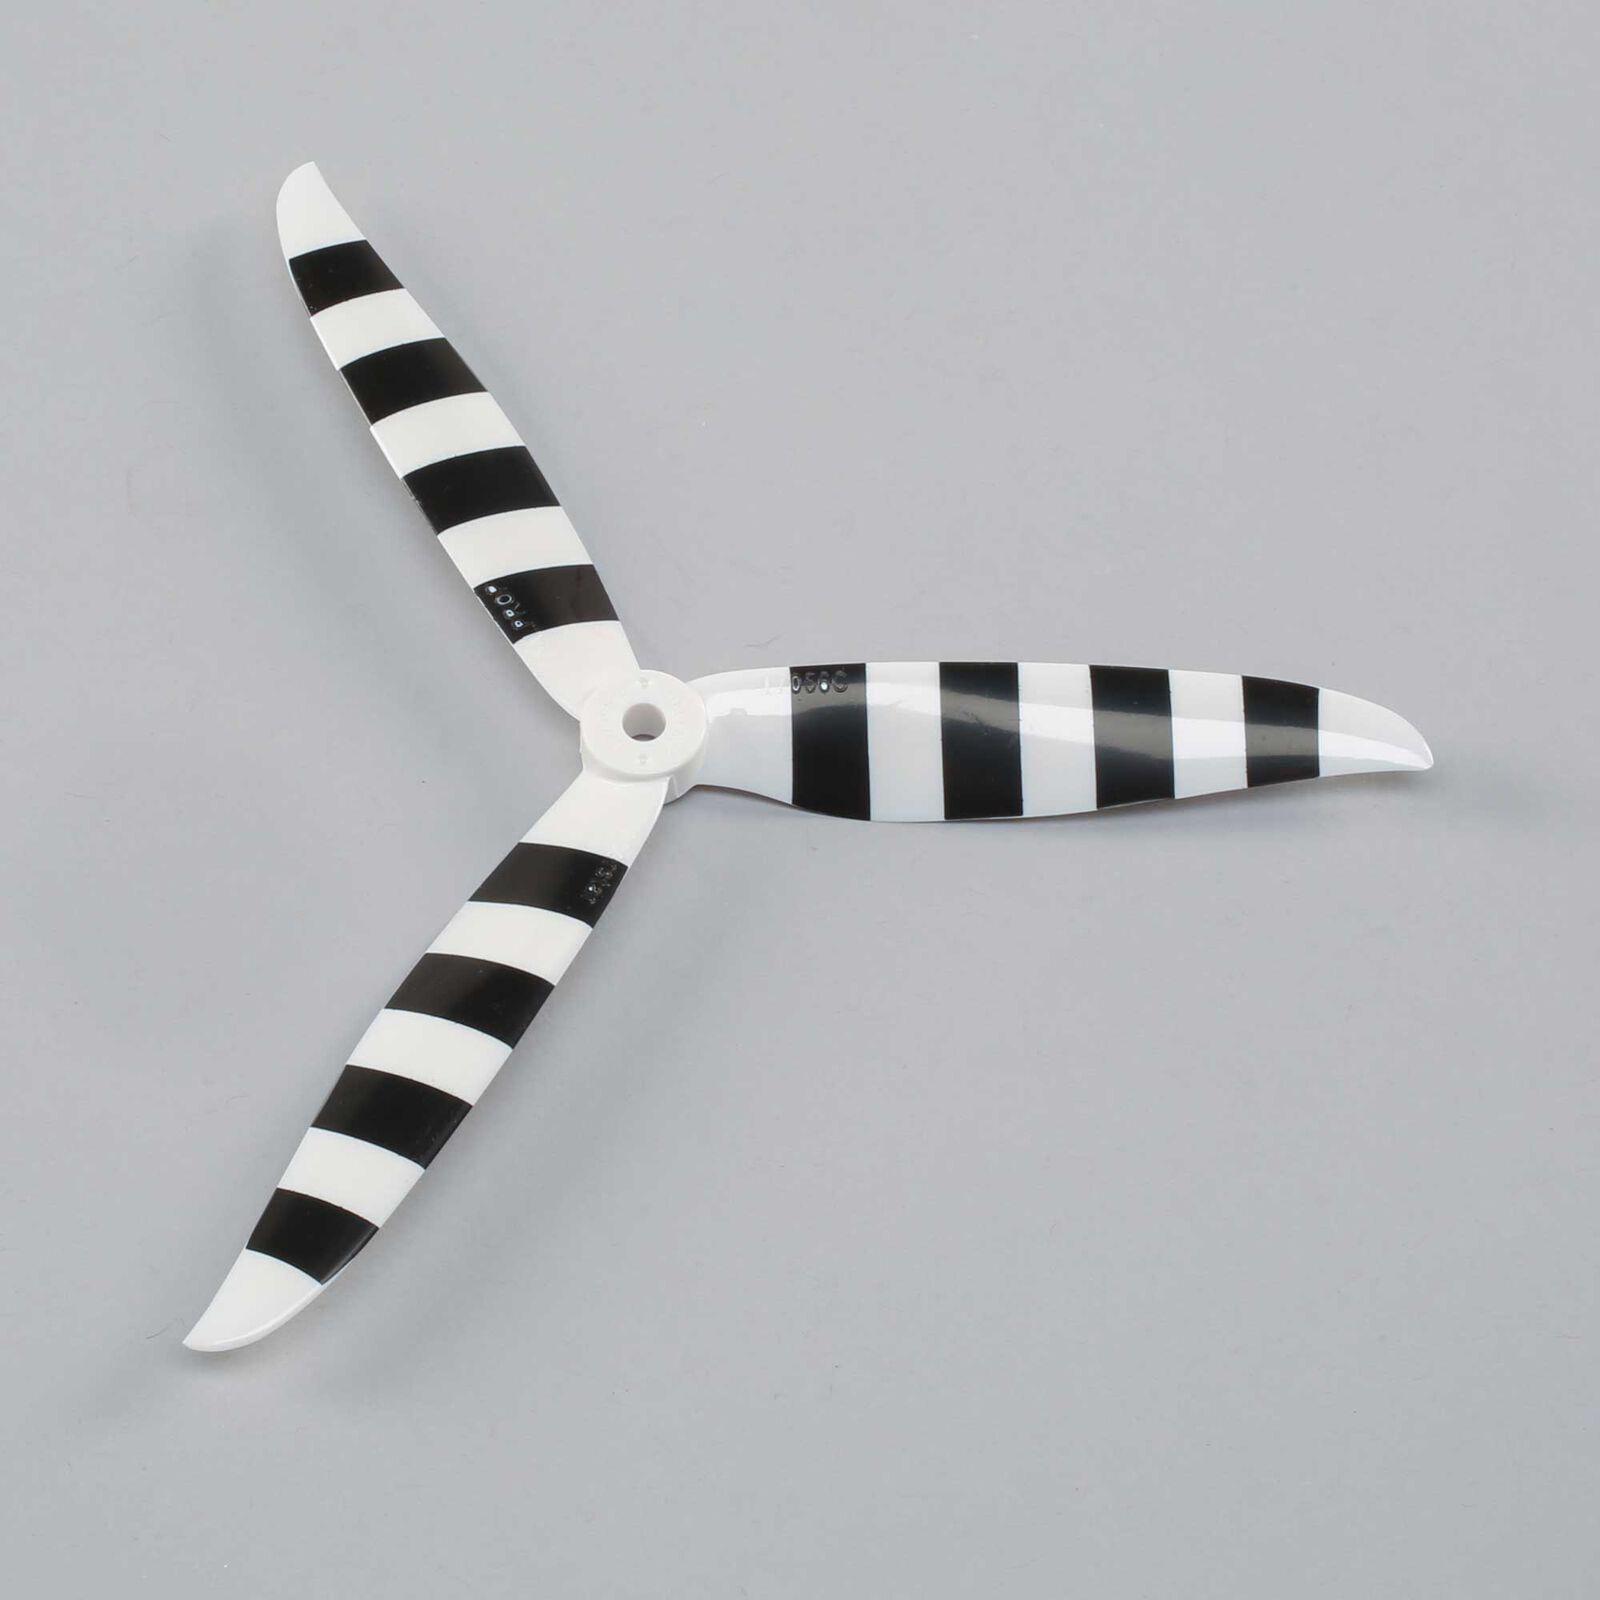 3 Blade Propeller, CW 7x5.6: Twin Otter